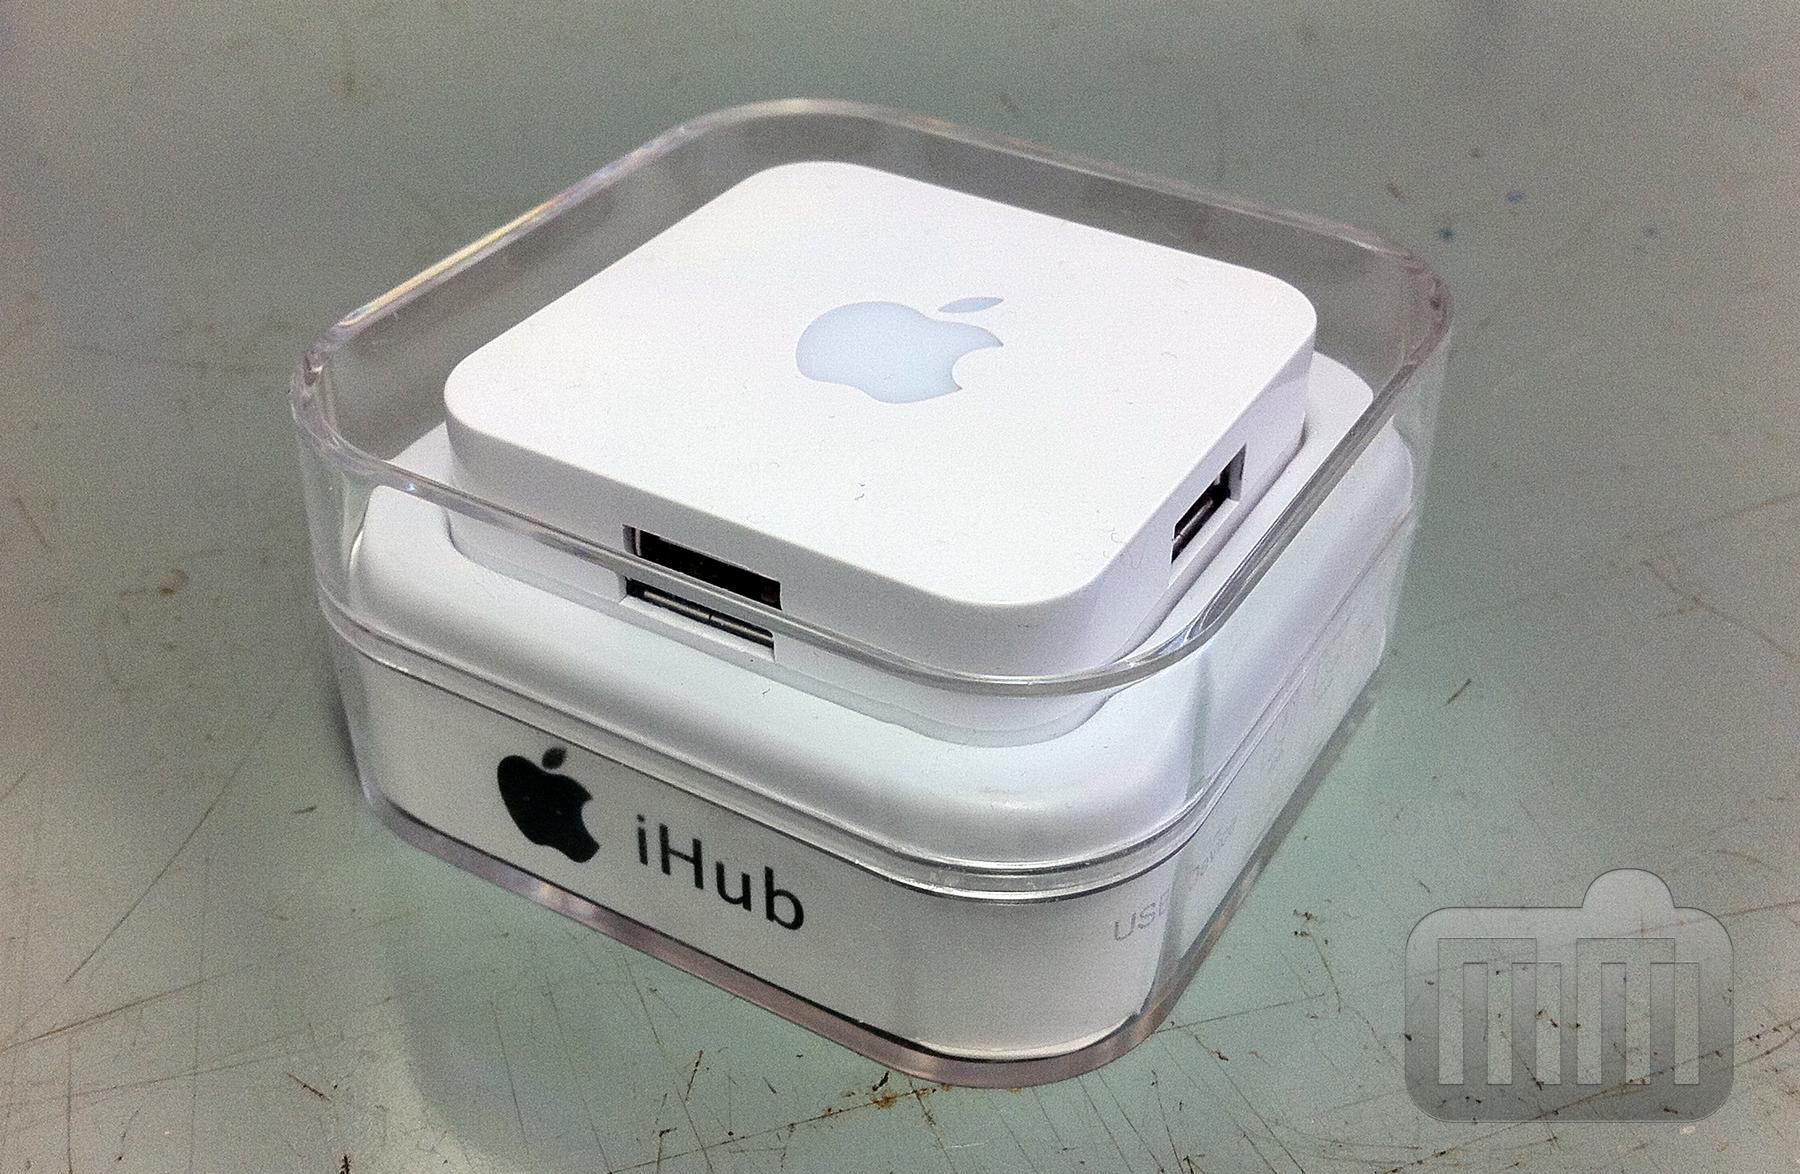 Embalagem do iHub